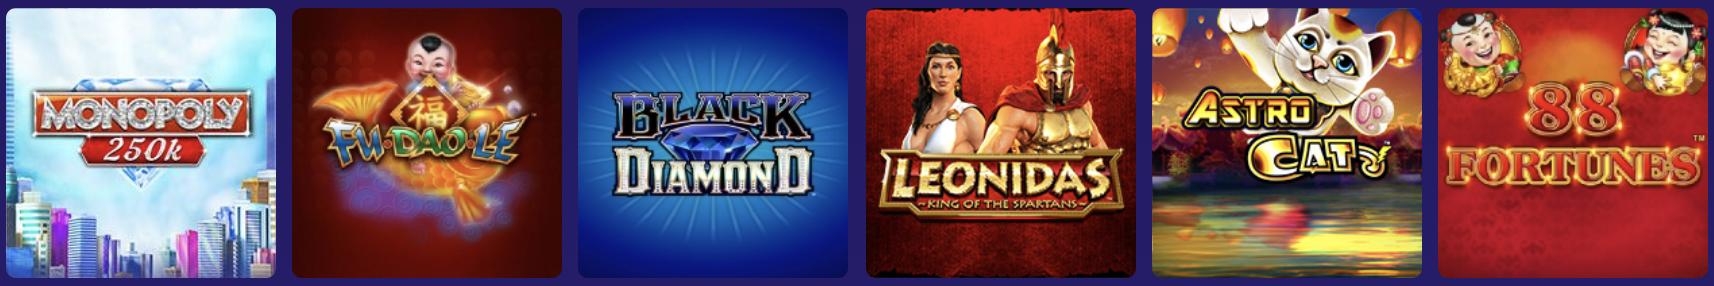 Party Casino Online NJ Slots